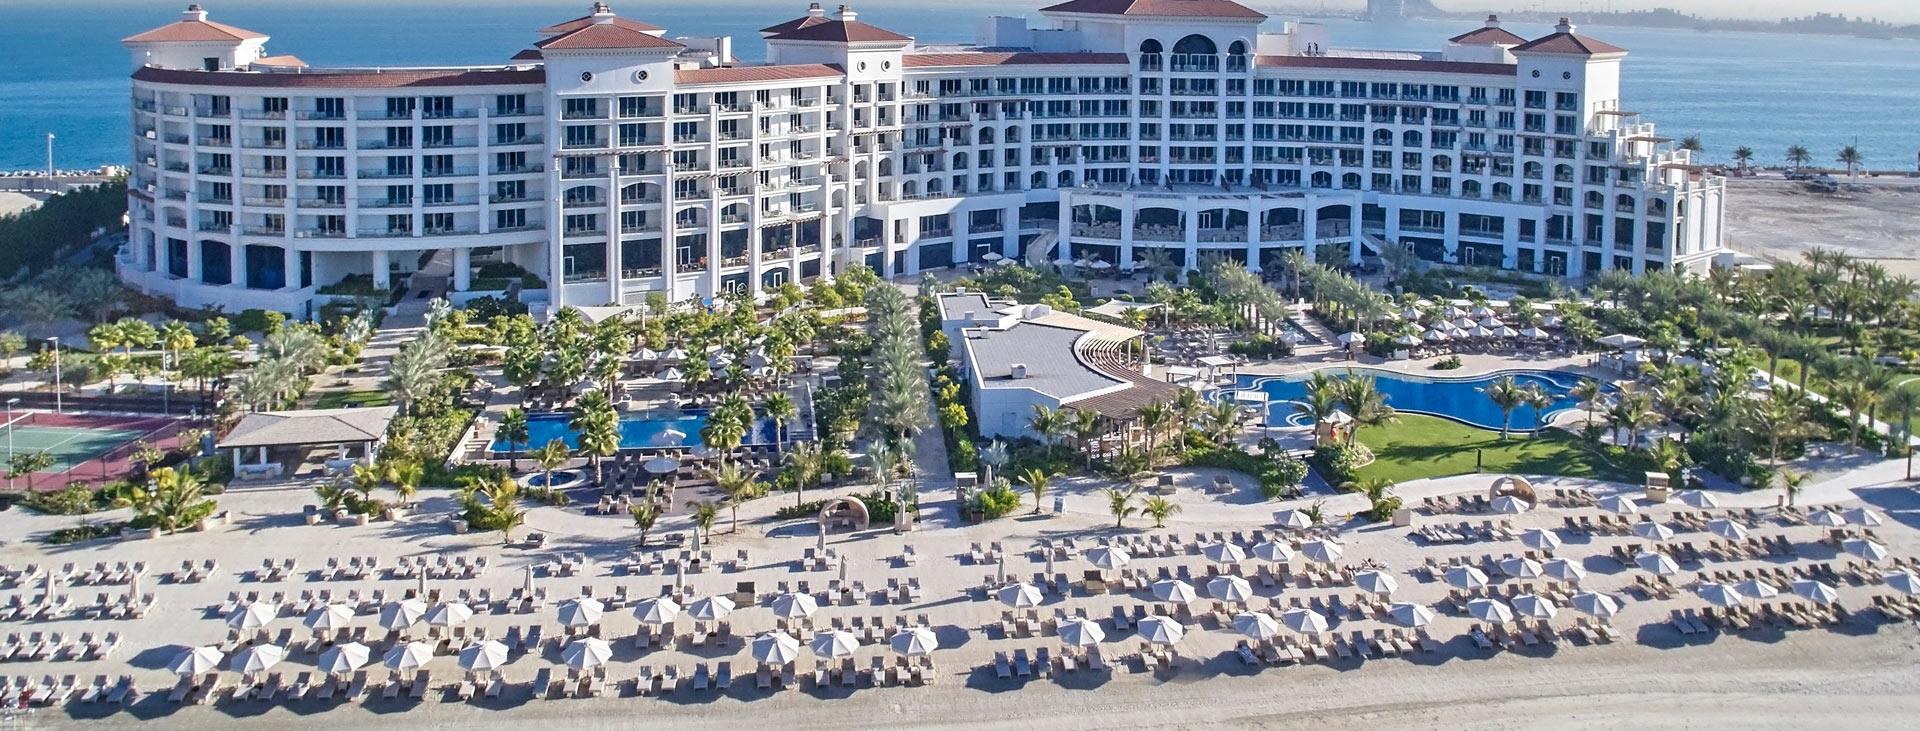 Waldorf Astoria Dubai Palm Jumeirah, Jumeirah Beach, Dubai, Förenade Arabemiraten